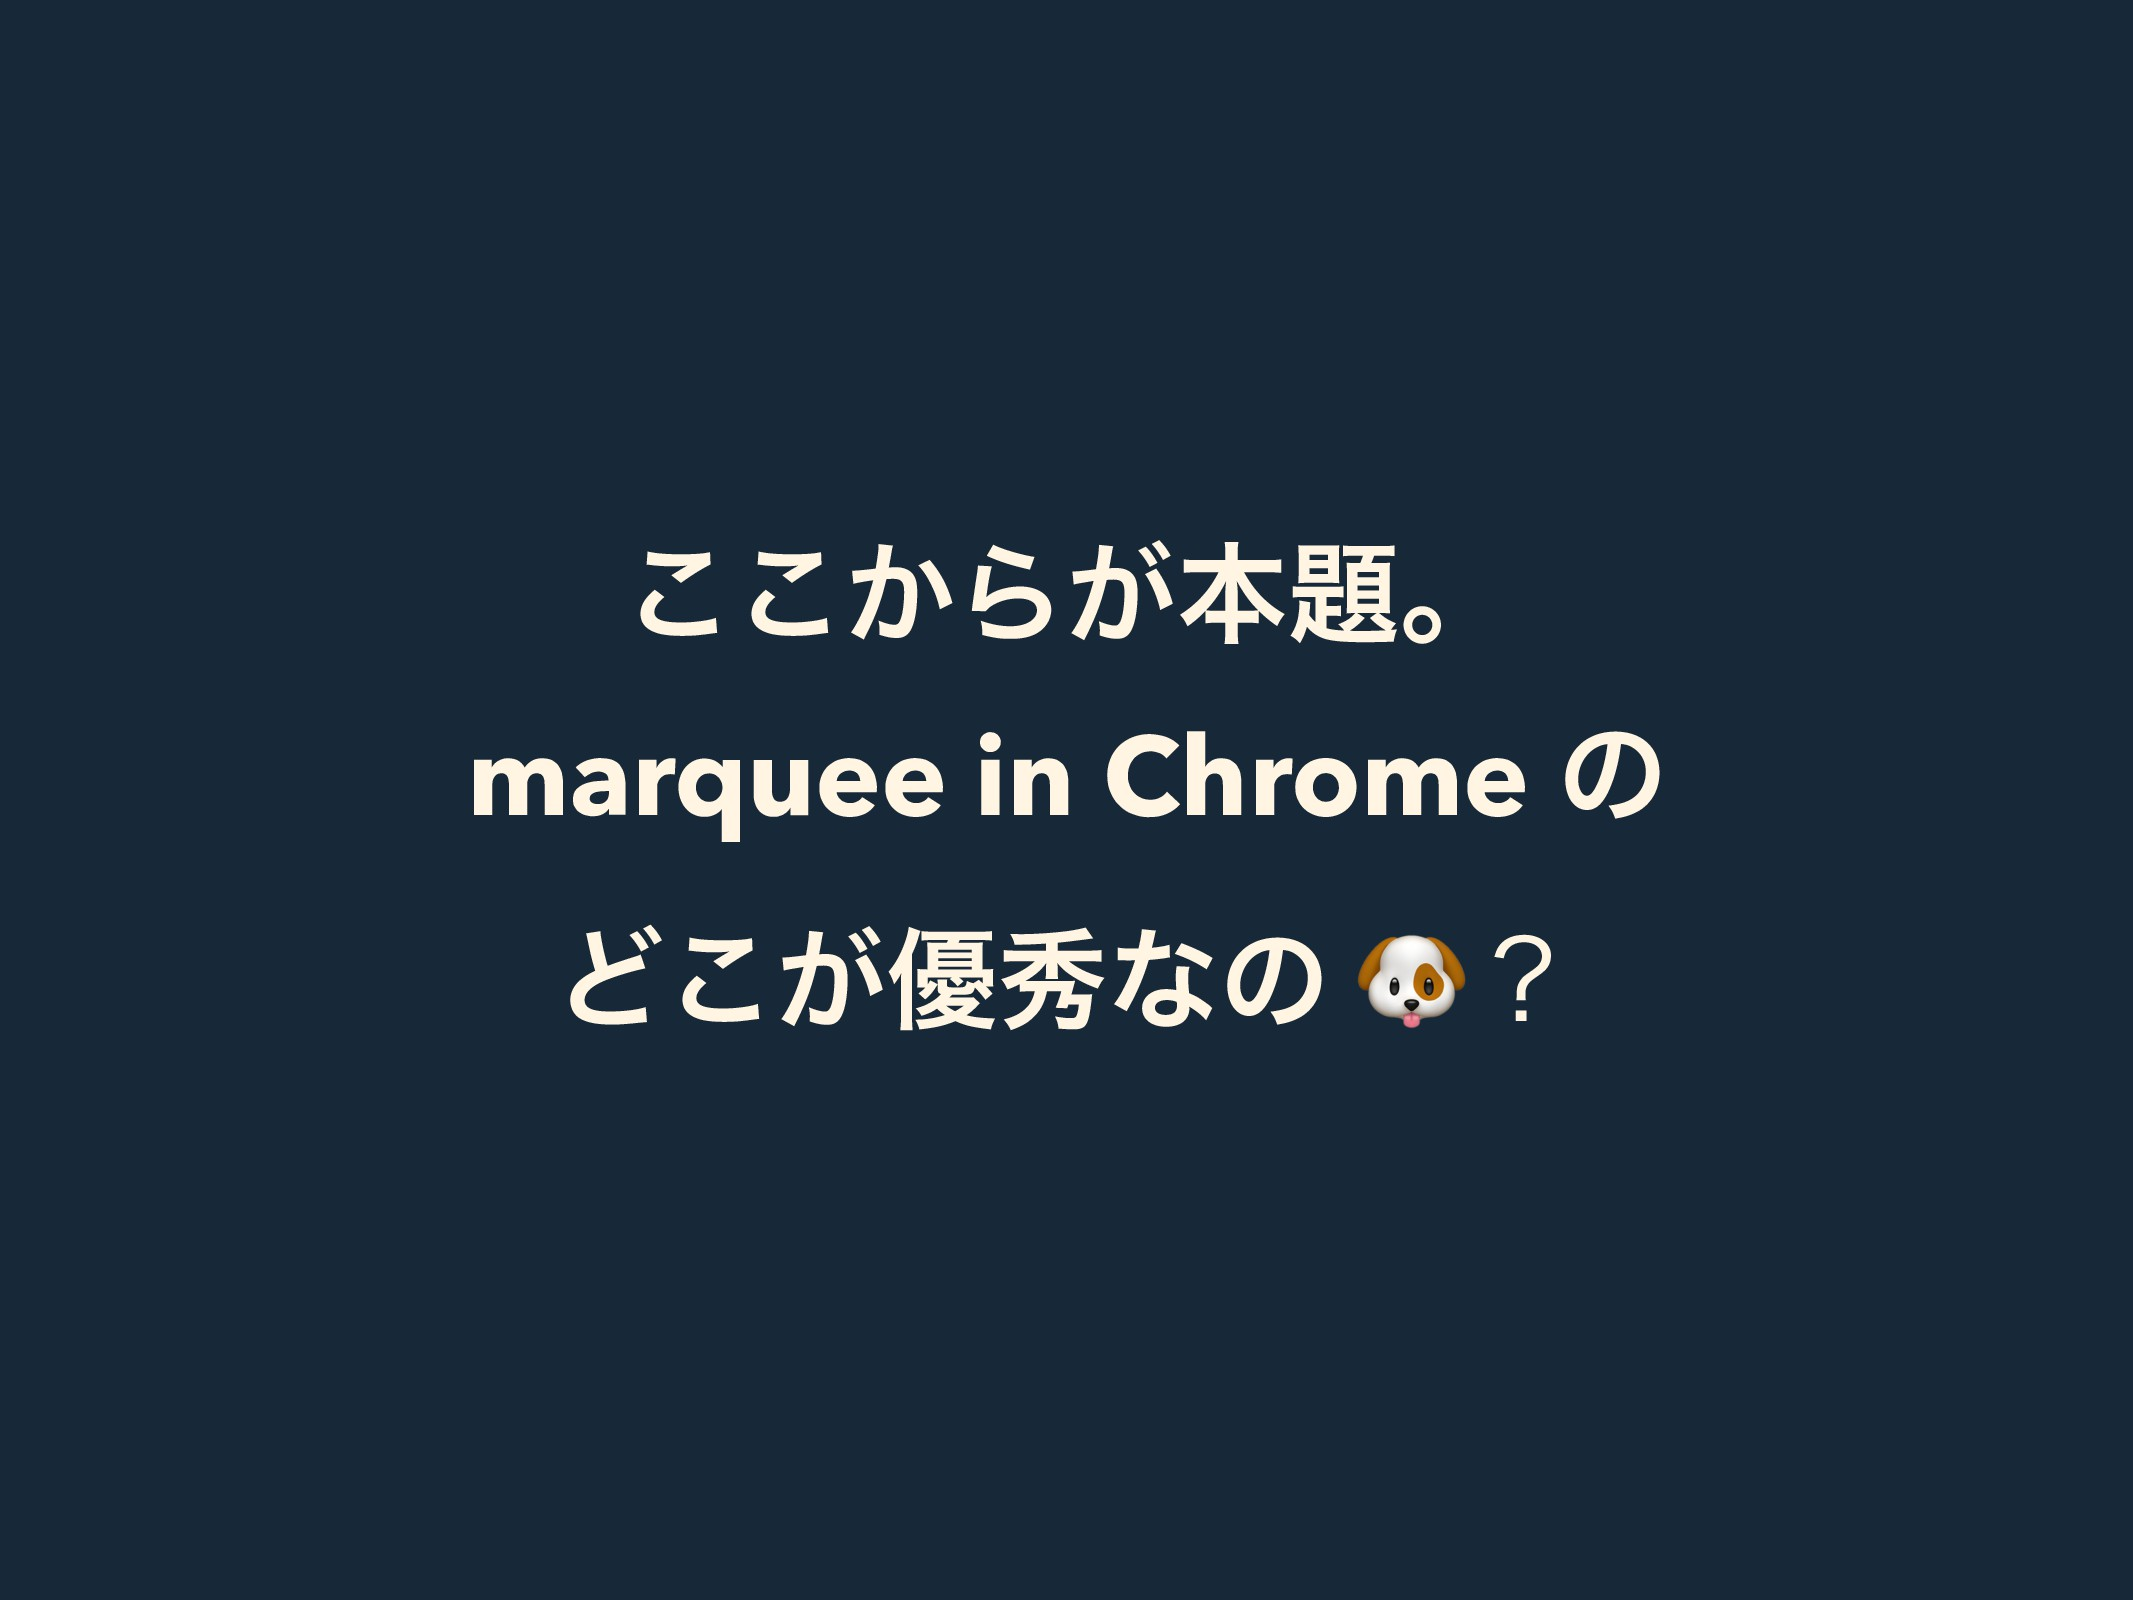 ͔͜͜Β͕ຊɻ marquee in Chrome ͷ Ͳ͕͜༏लͳͷ ʁ